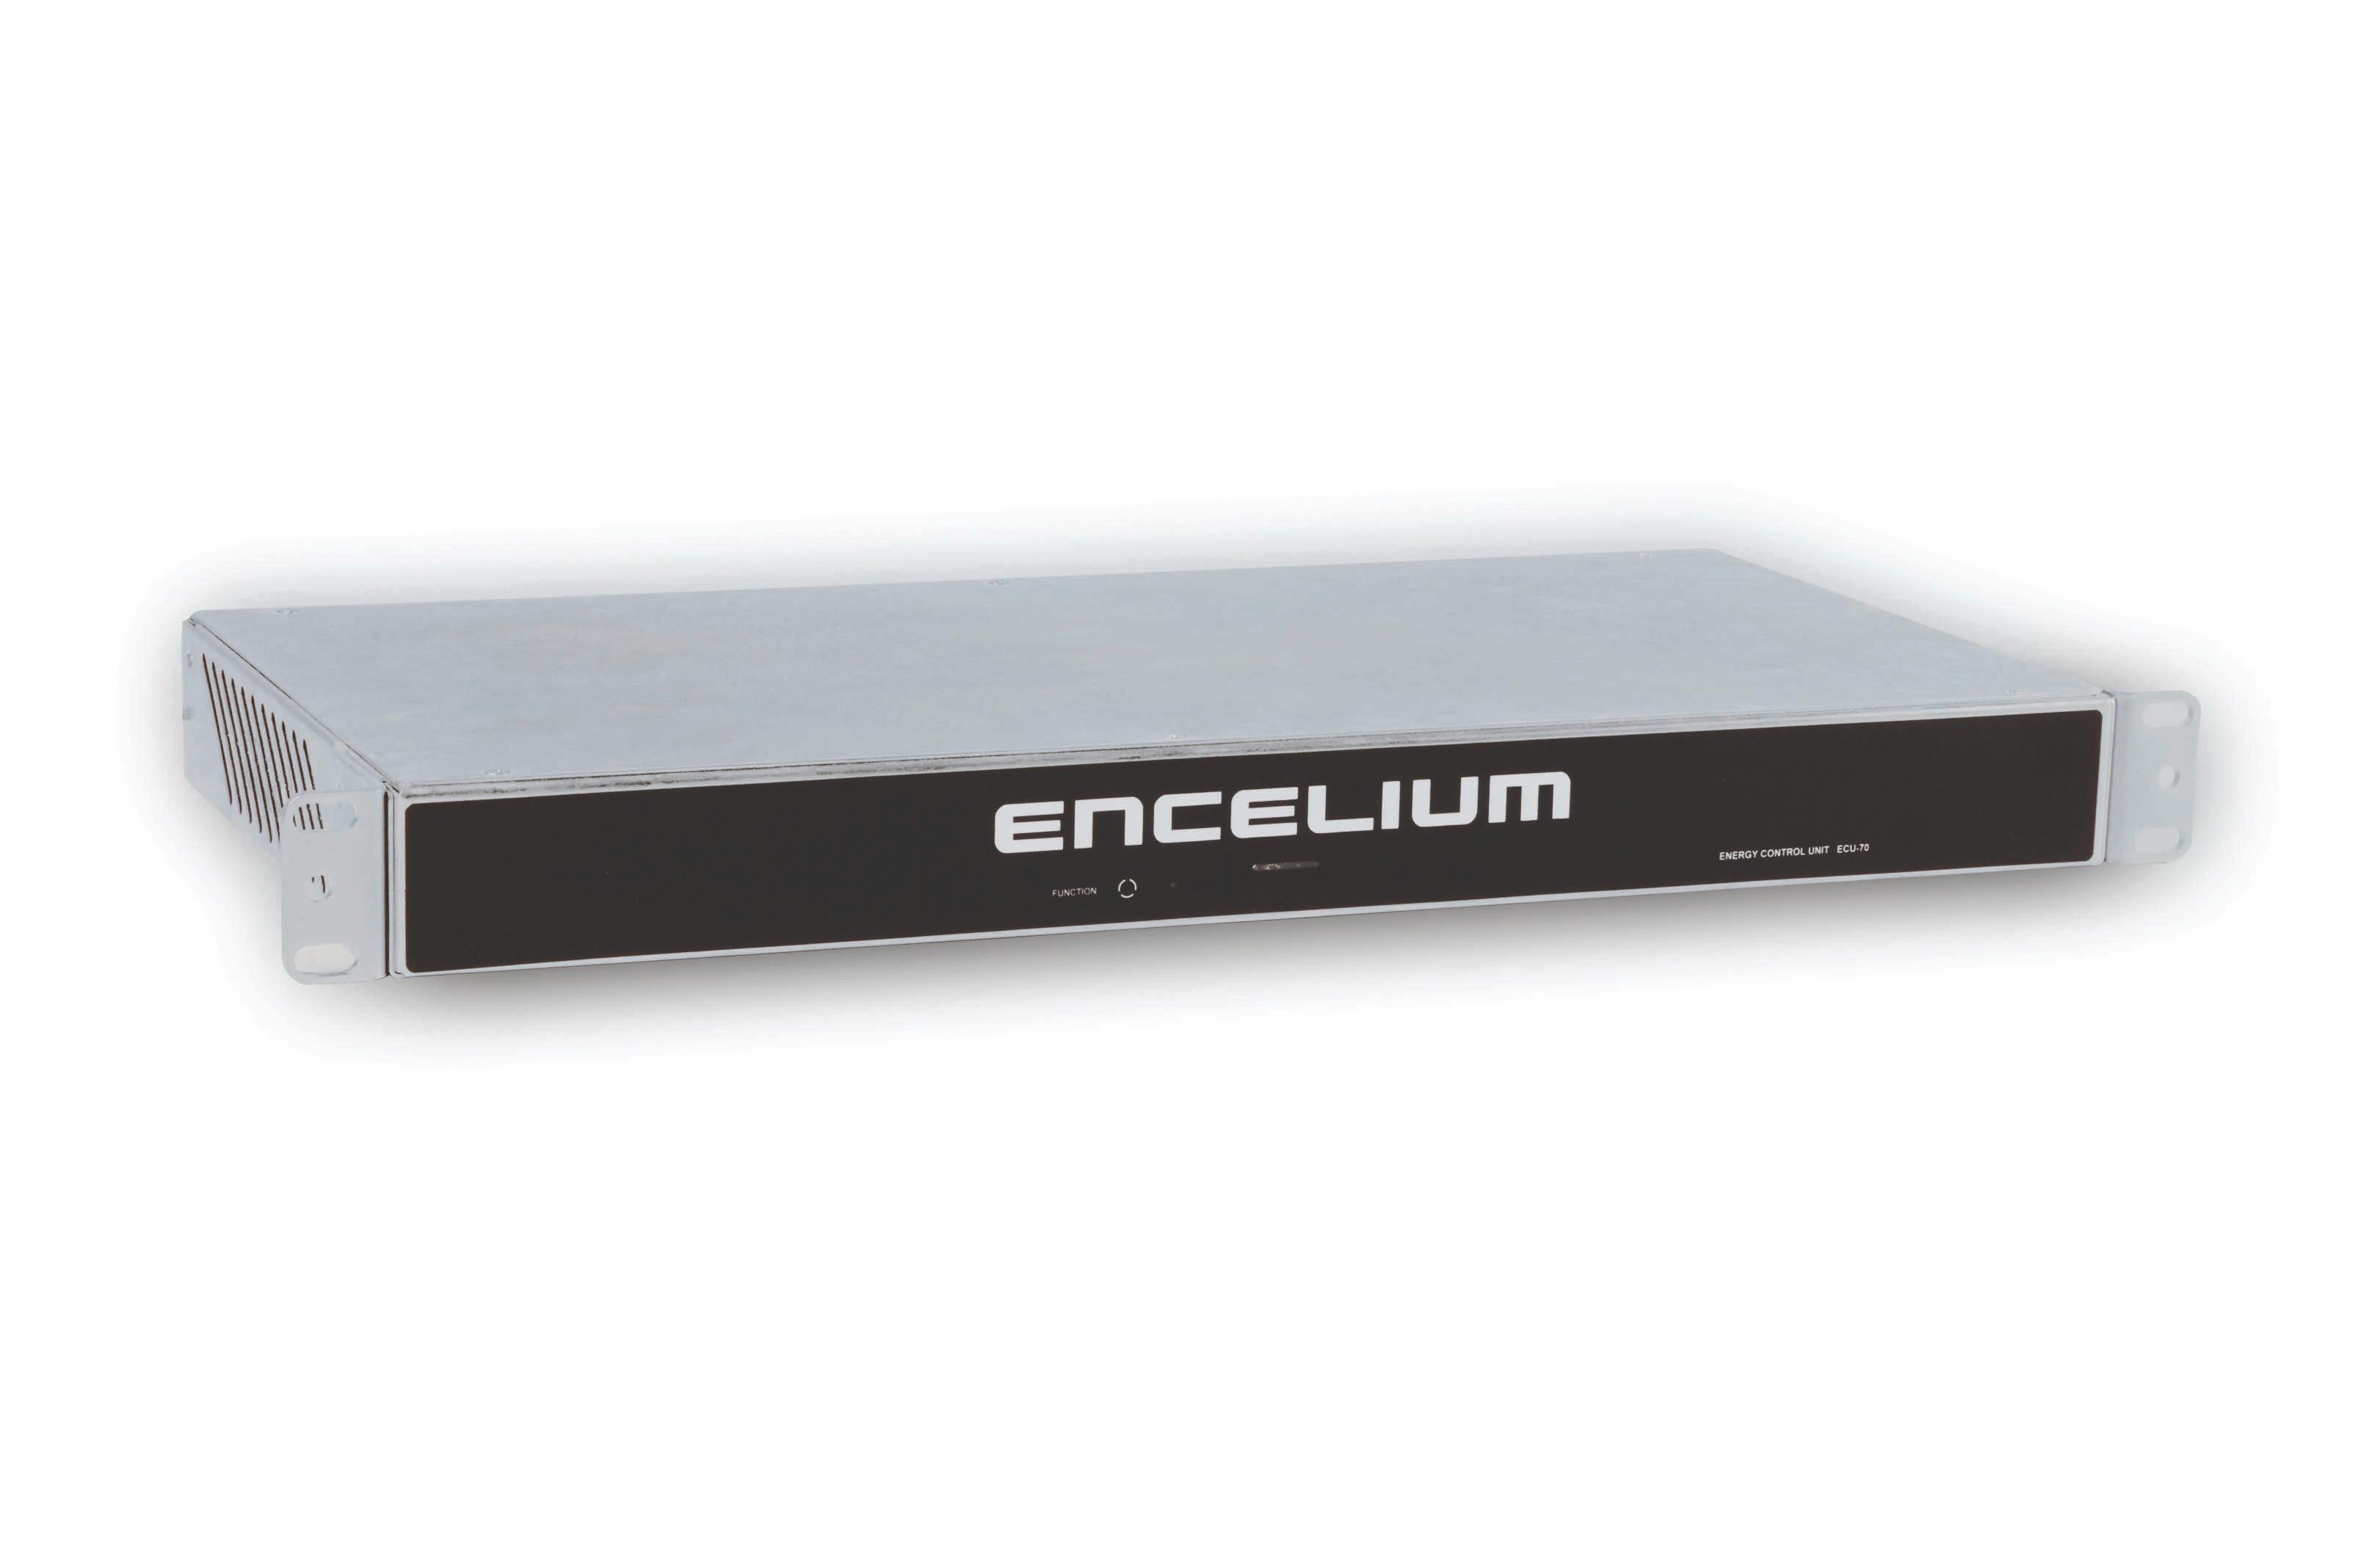 LMS053_ECU energy control unit digital lighting systems encelium wiring diagram at readyjetset.co